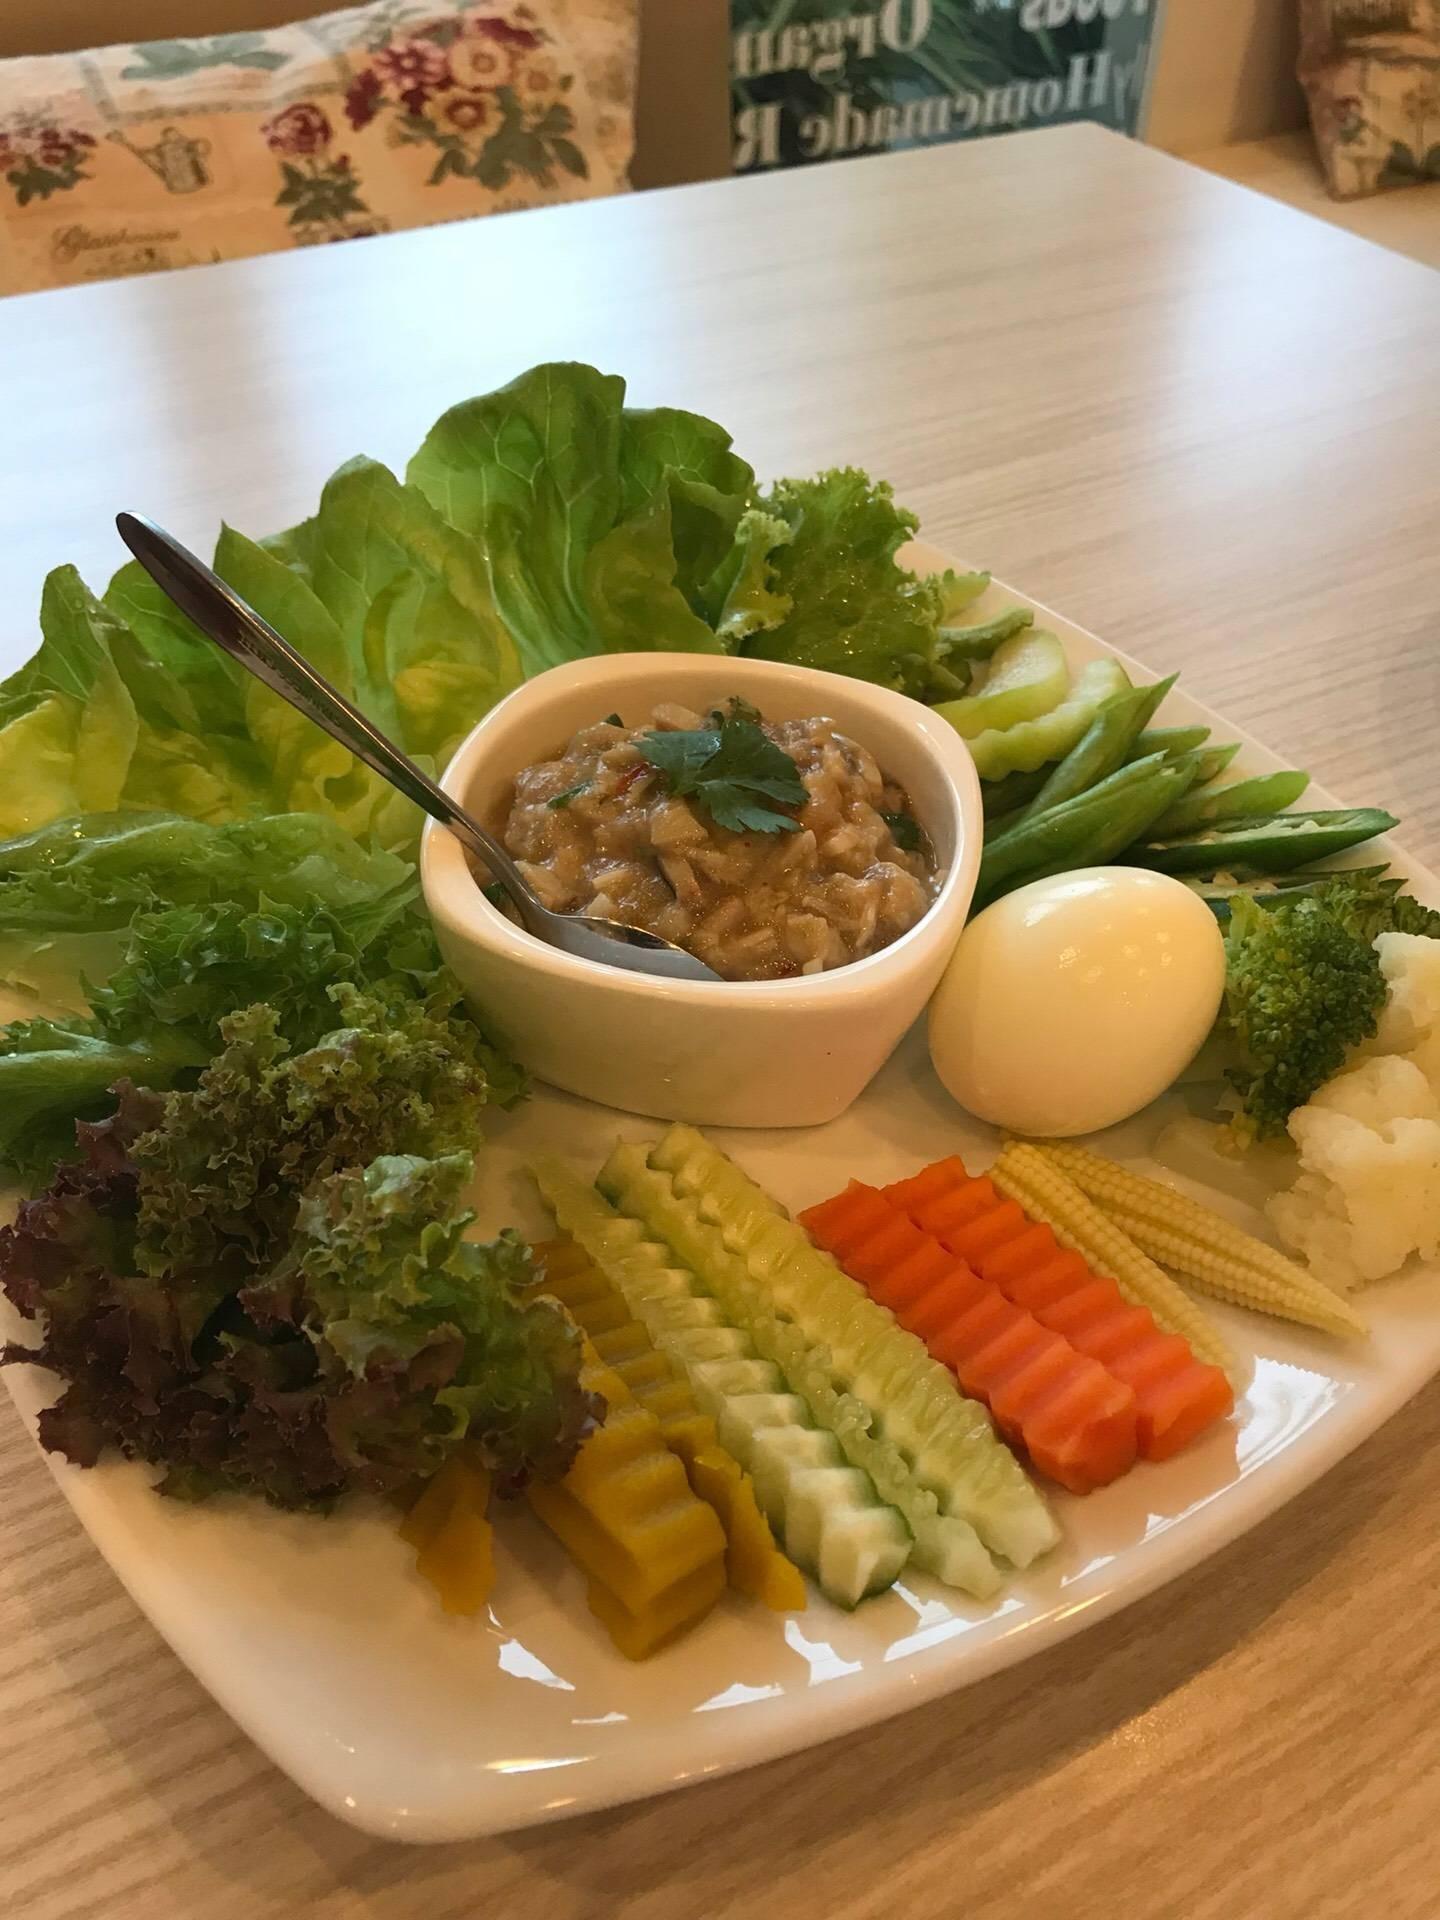 Salada Organic Kitchen (ซาลาด้า ออร์แกนิค คิทเช่น) บองมาเช่